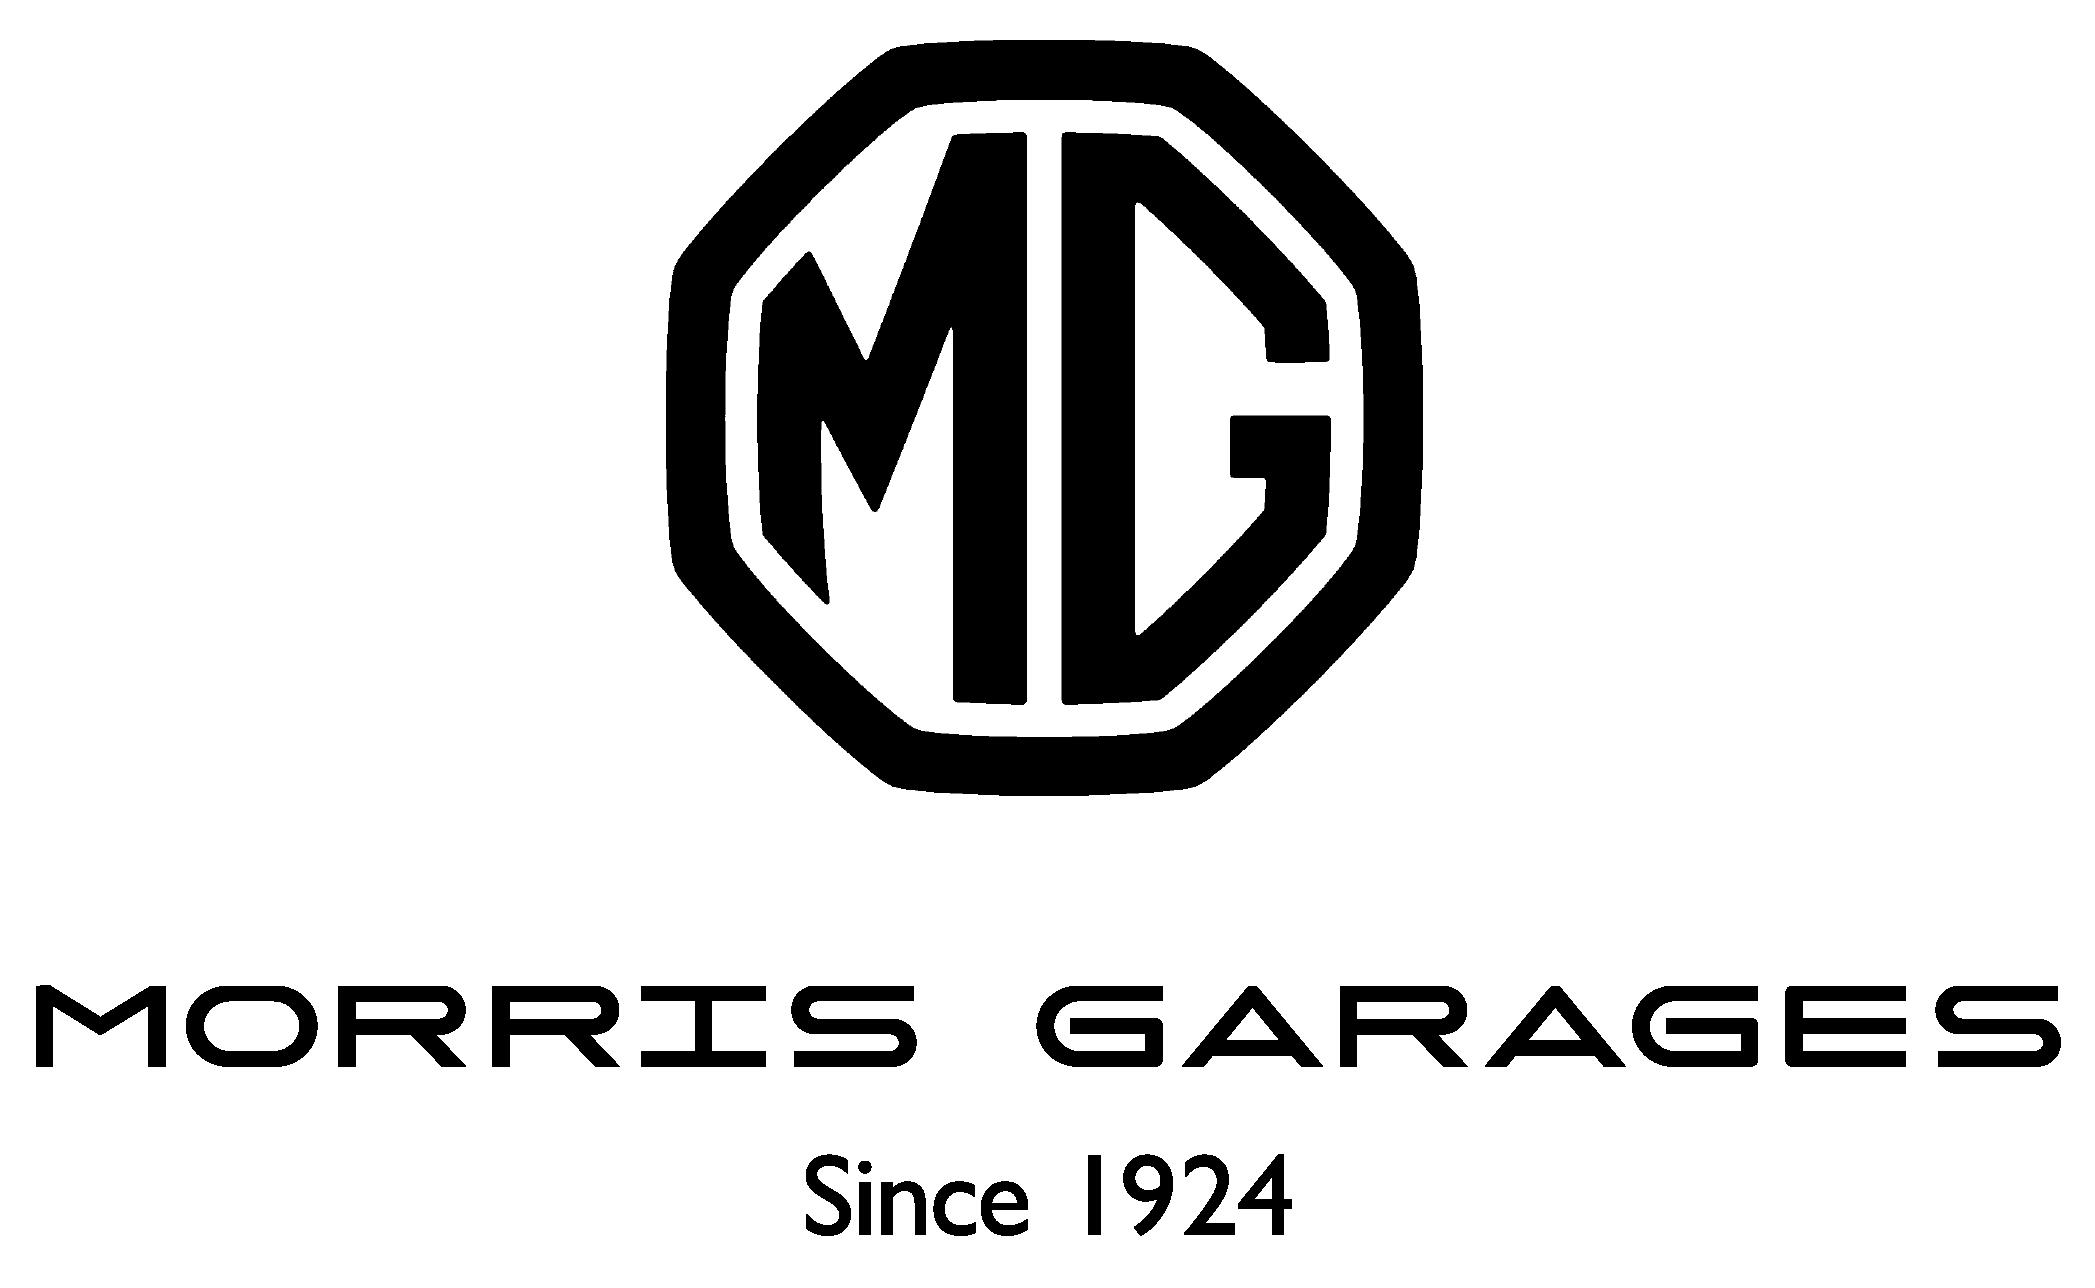 https://assets.roar.media/assets/0IFJgwBvLcWz8r9U_MG_Logo-02-(1).png